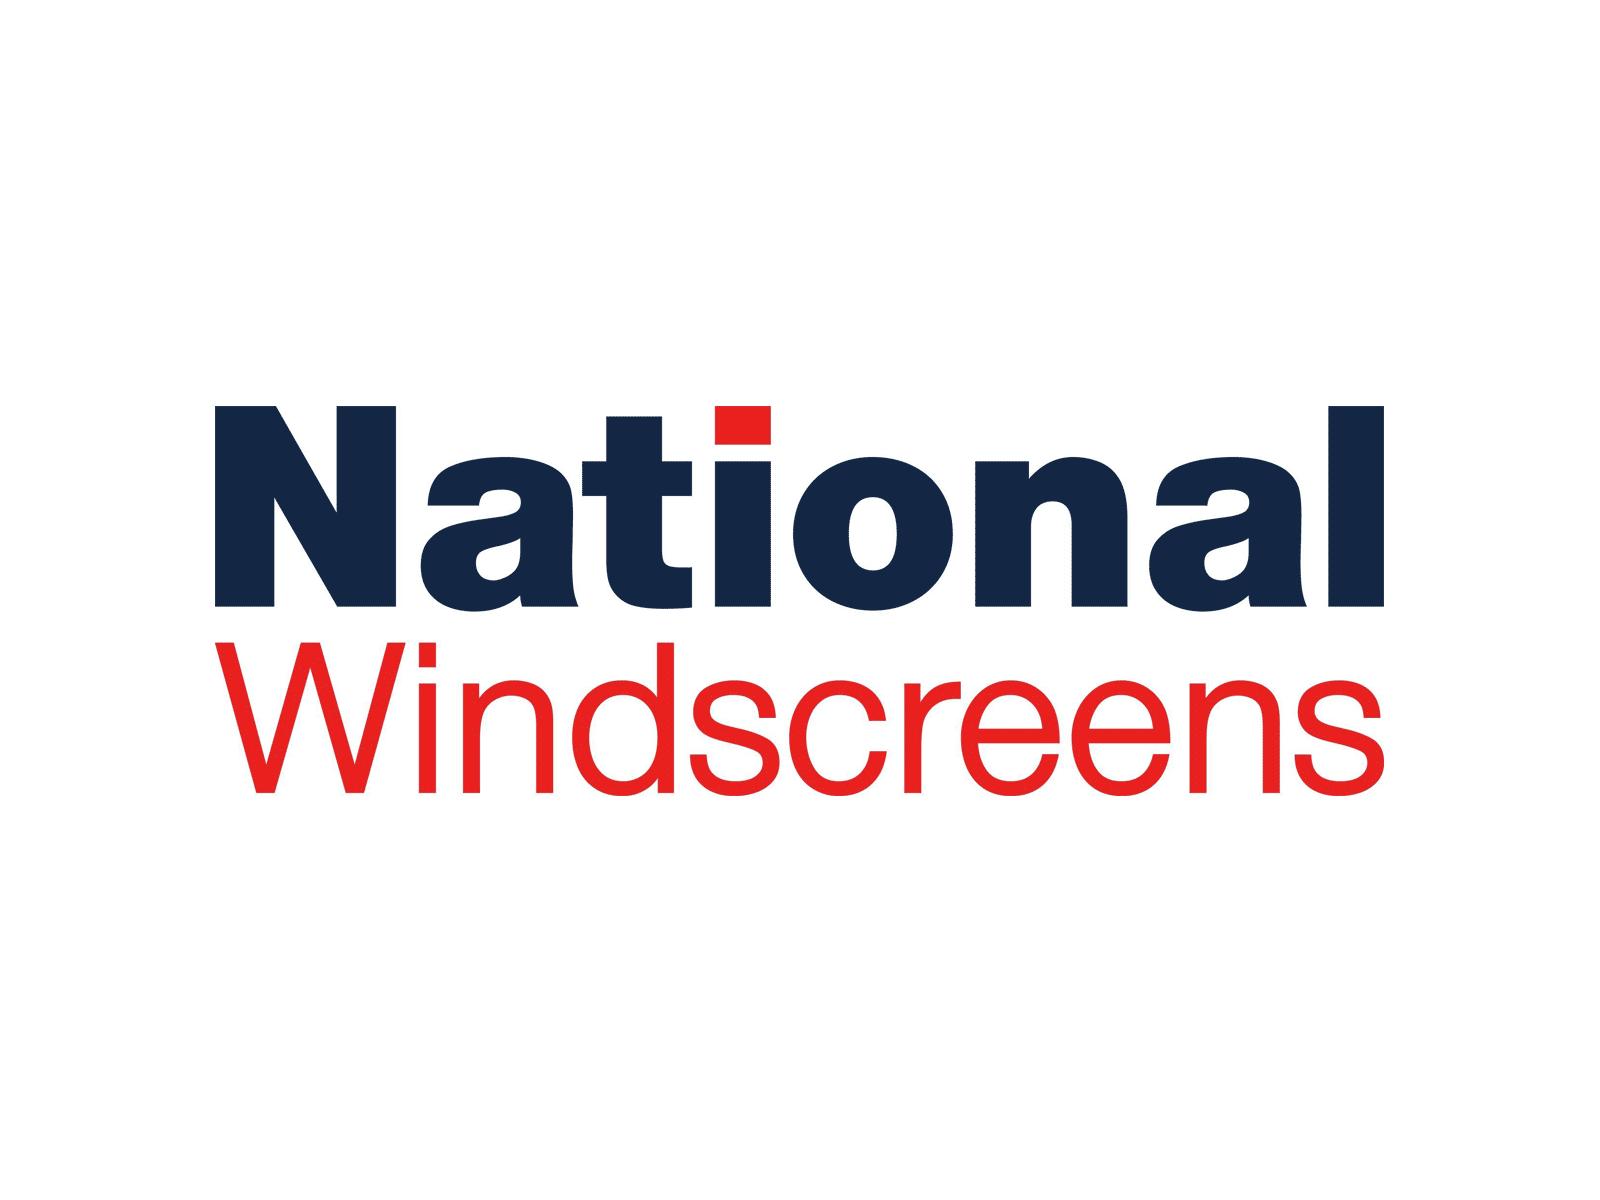 Business Partner National Windscreens